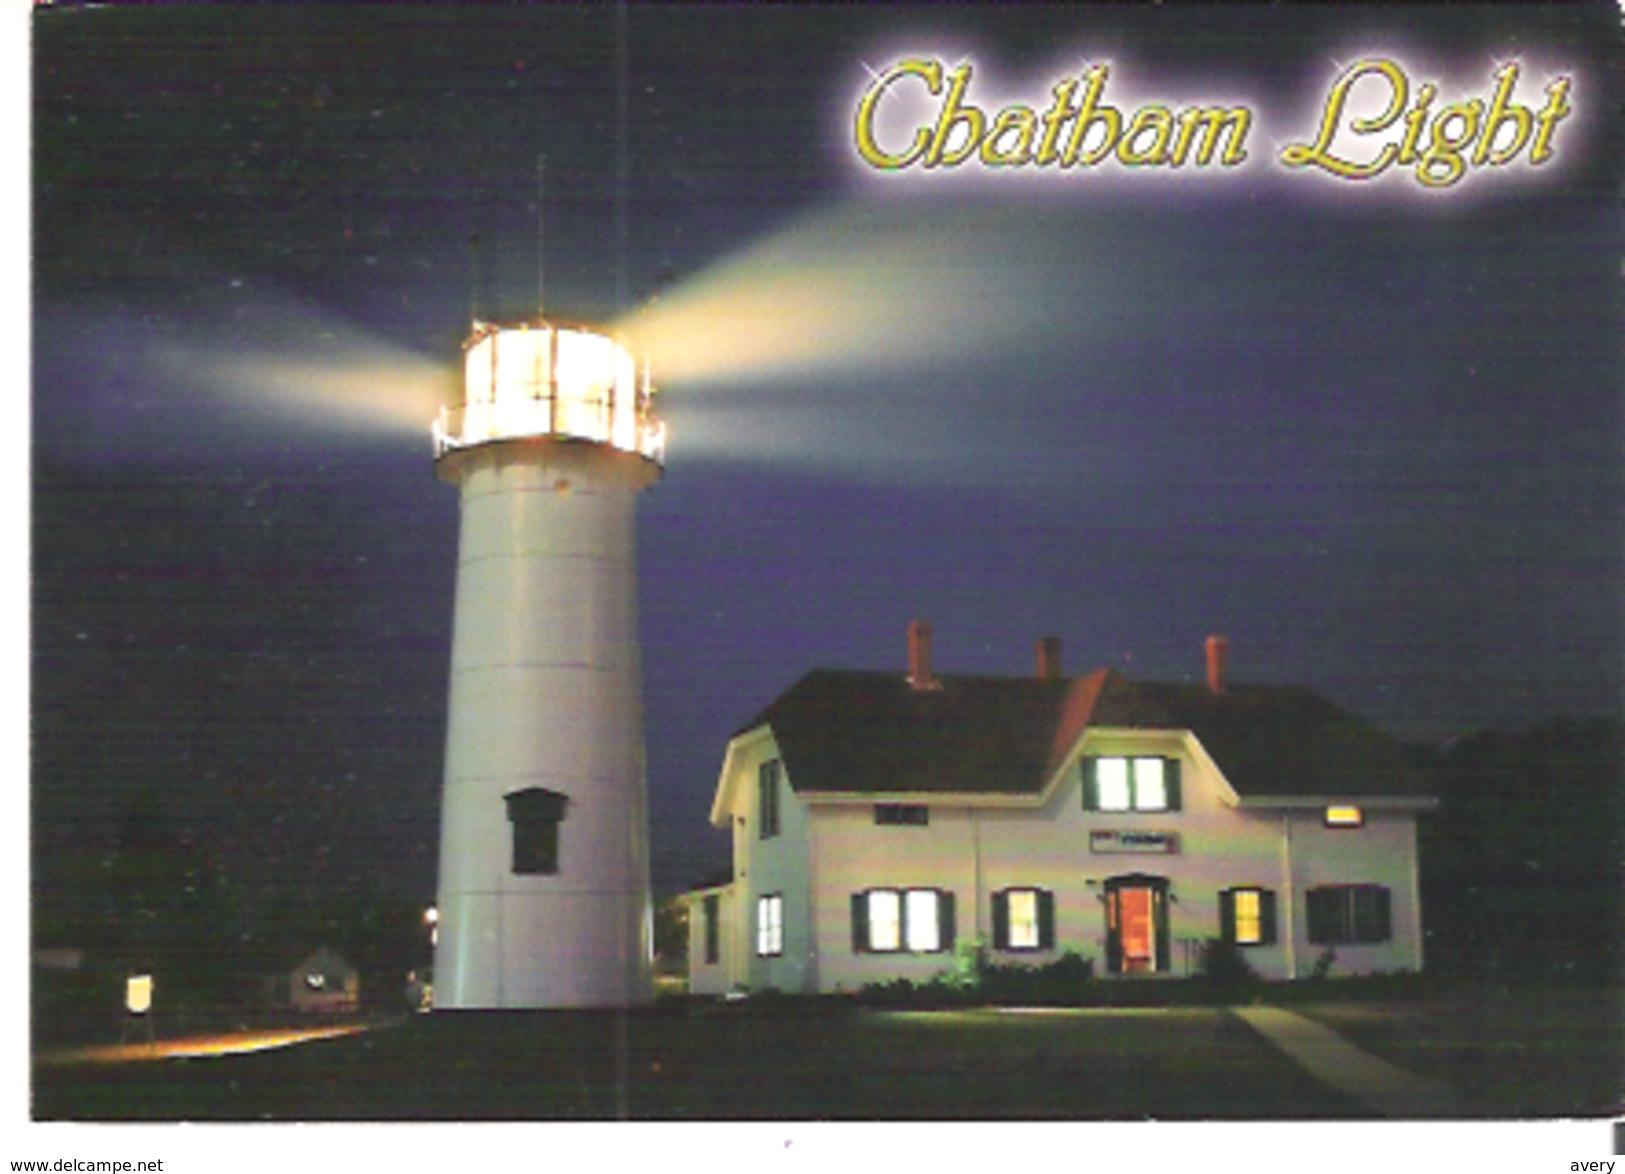 Chatham Light, Chatham Cape Cod, Massachusetts - Cape Cod